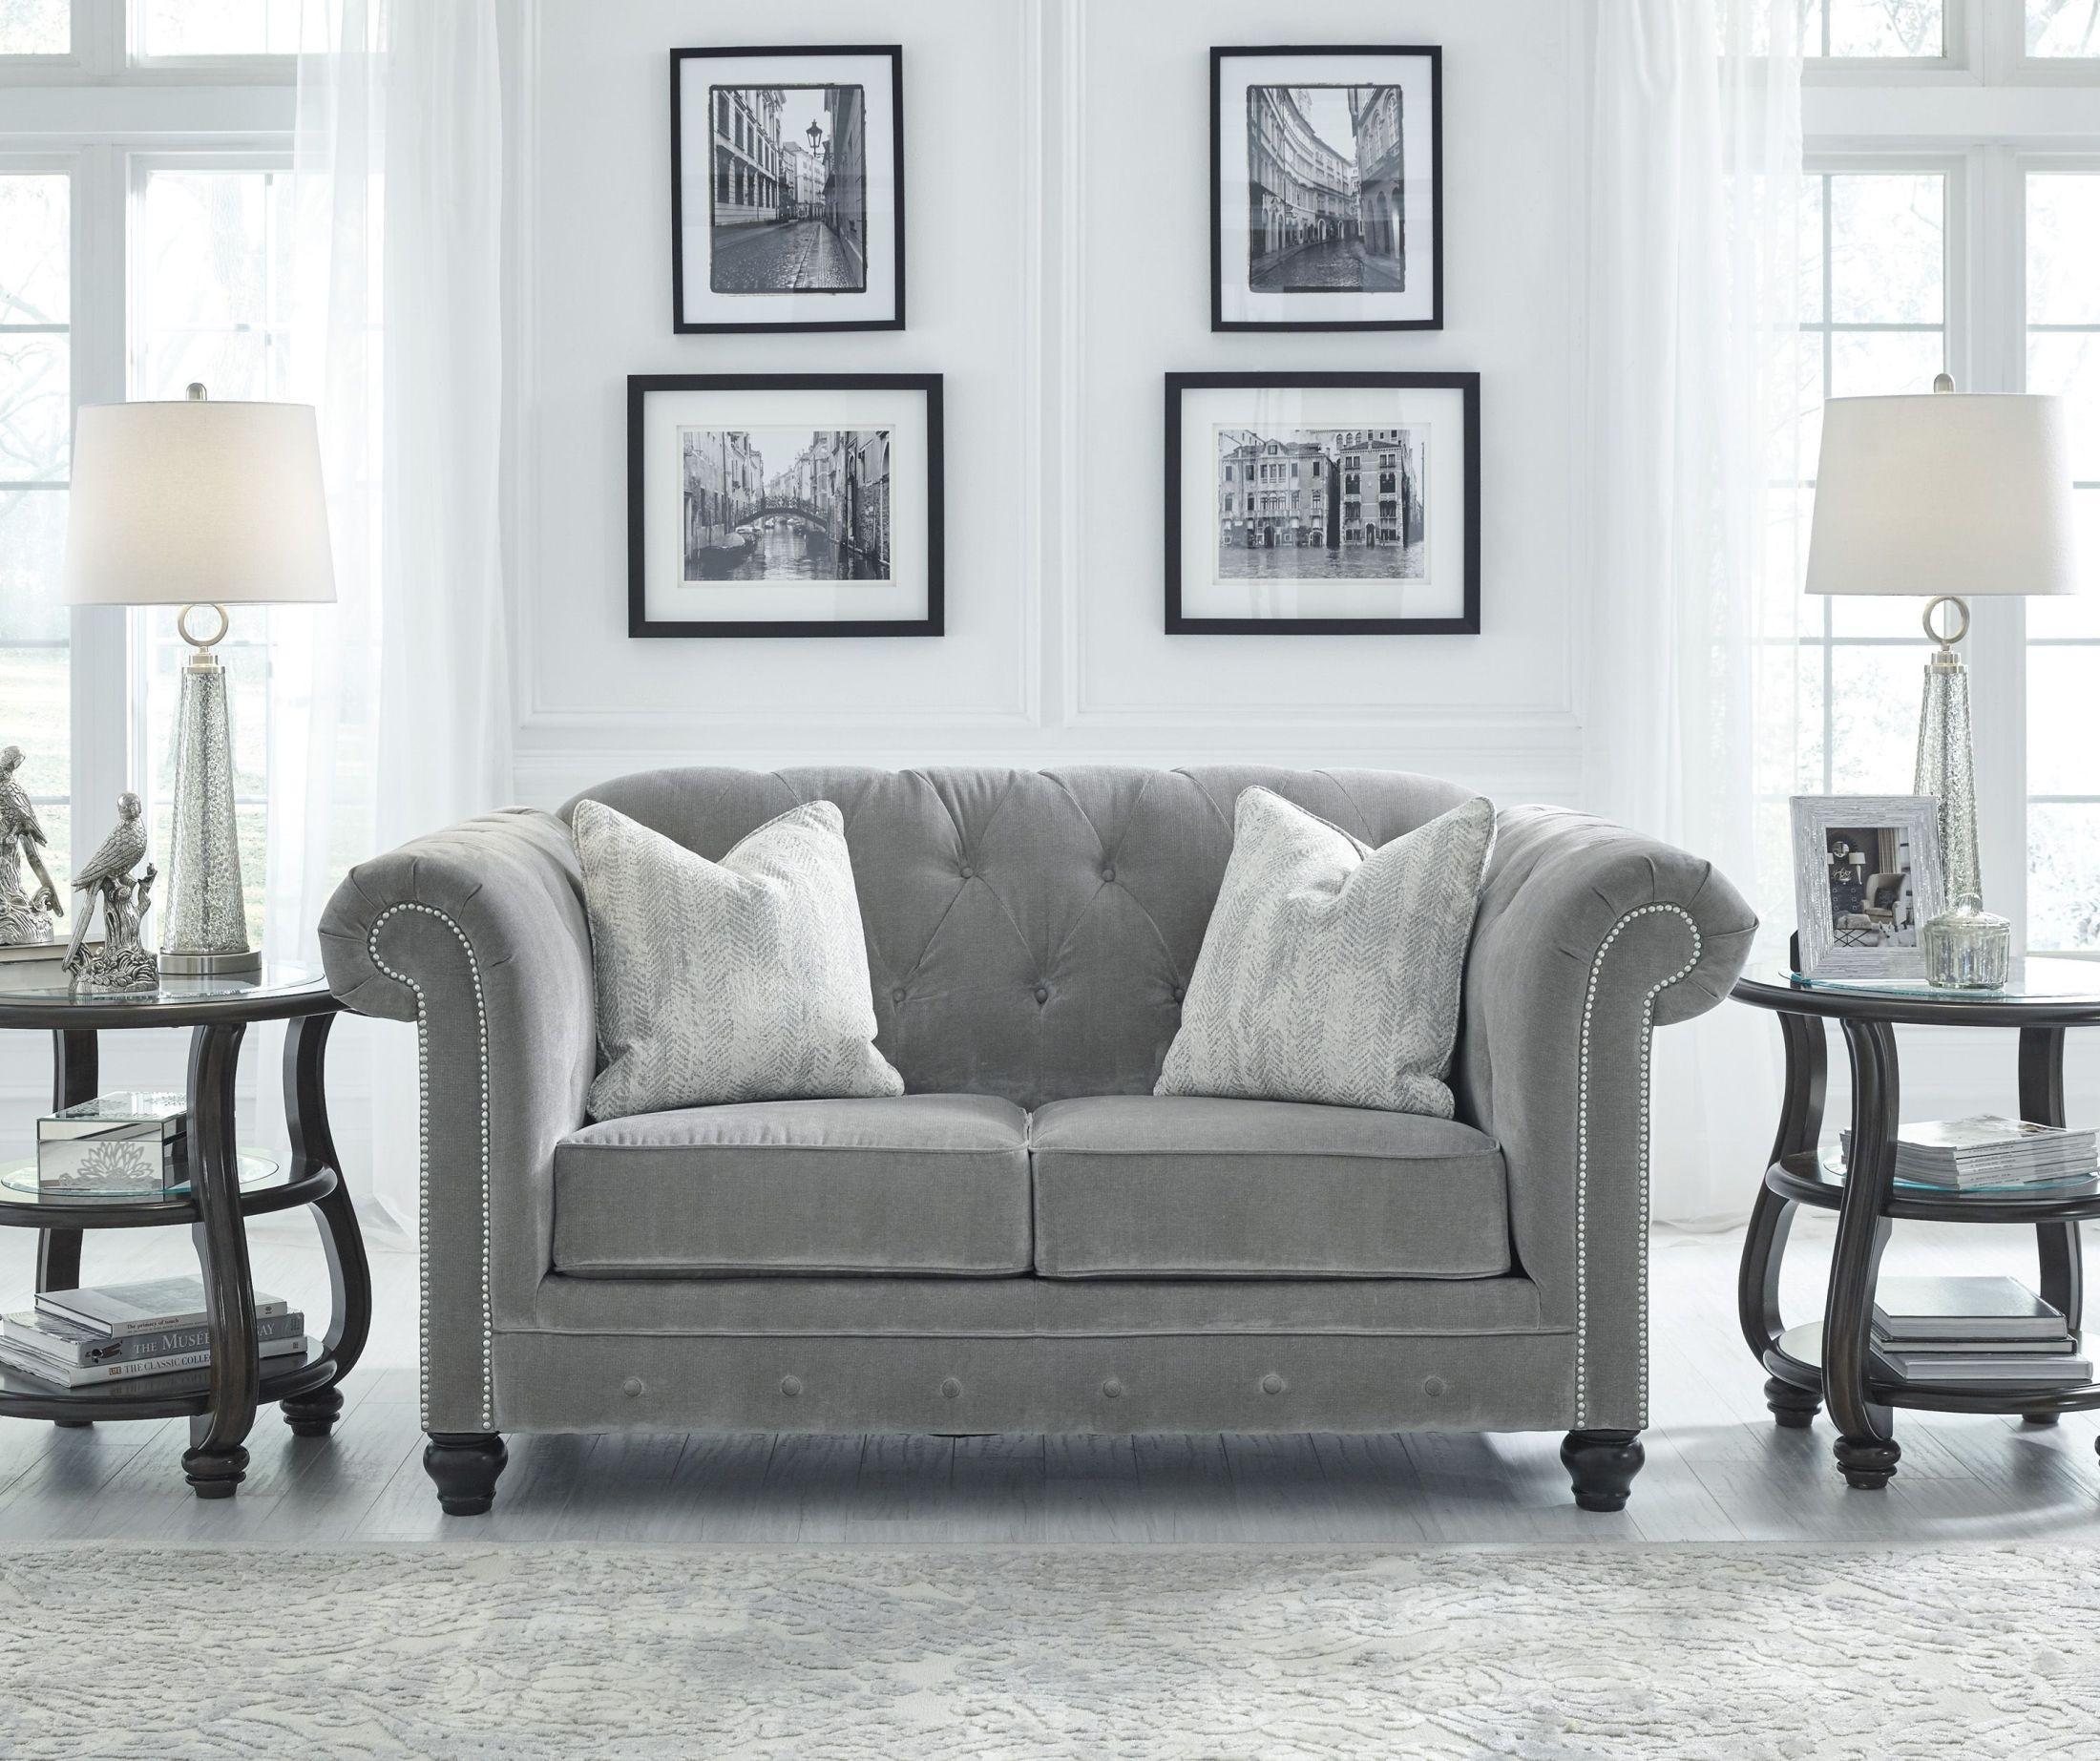 Tiarella Ash Loveseat from Ashley | Coleman Furniture